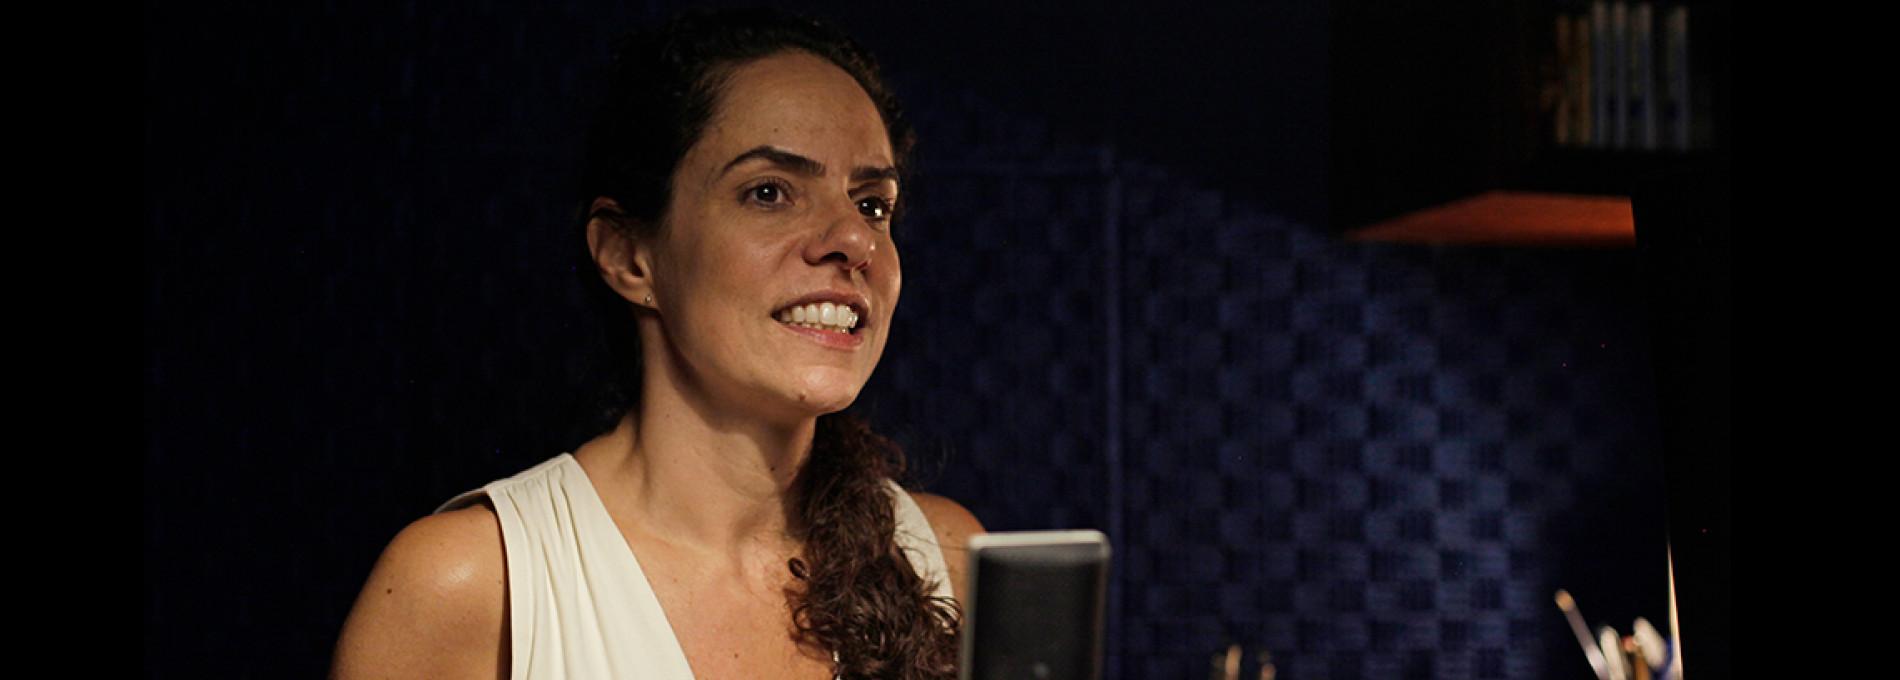 Paula Nader, co-fundadora da Grow